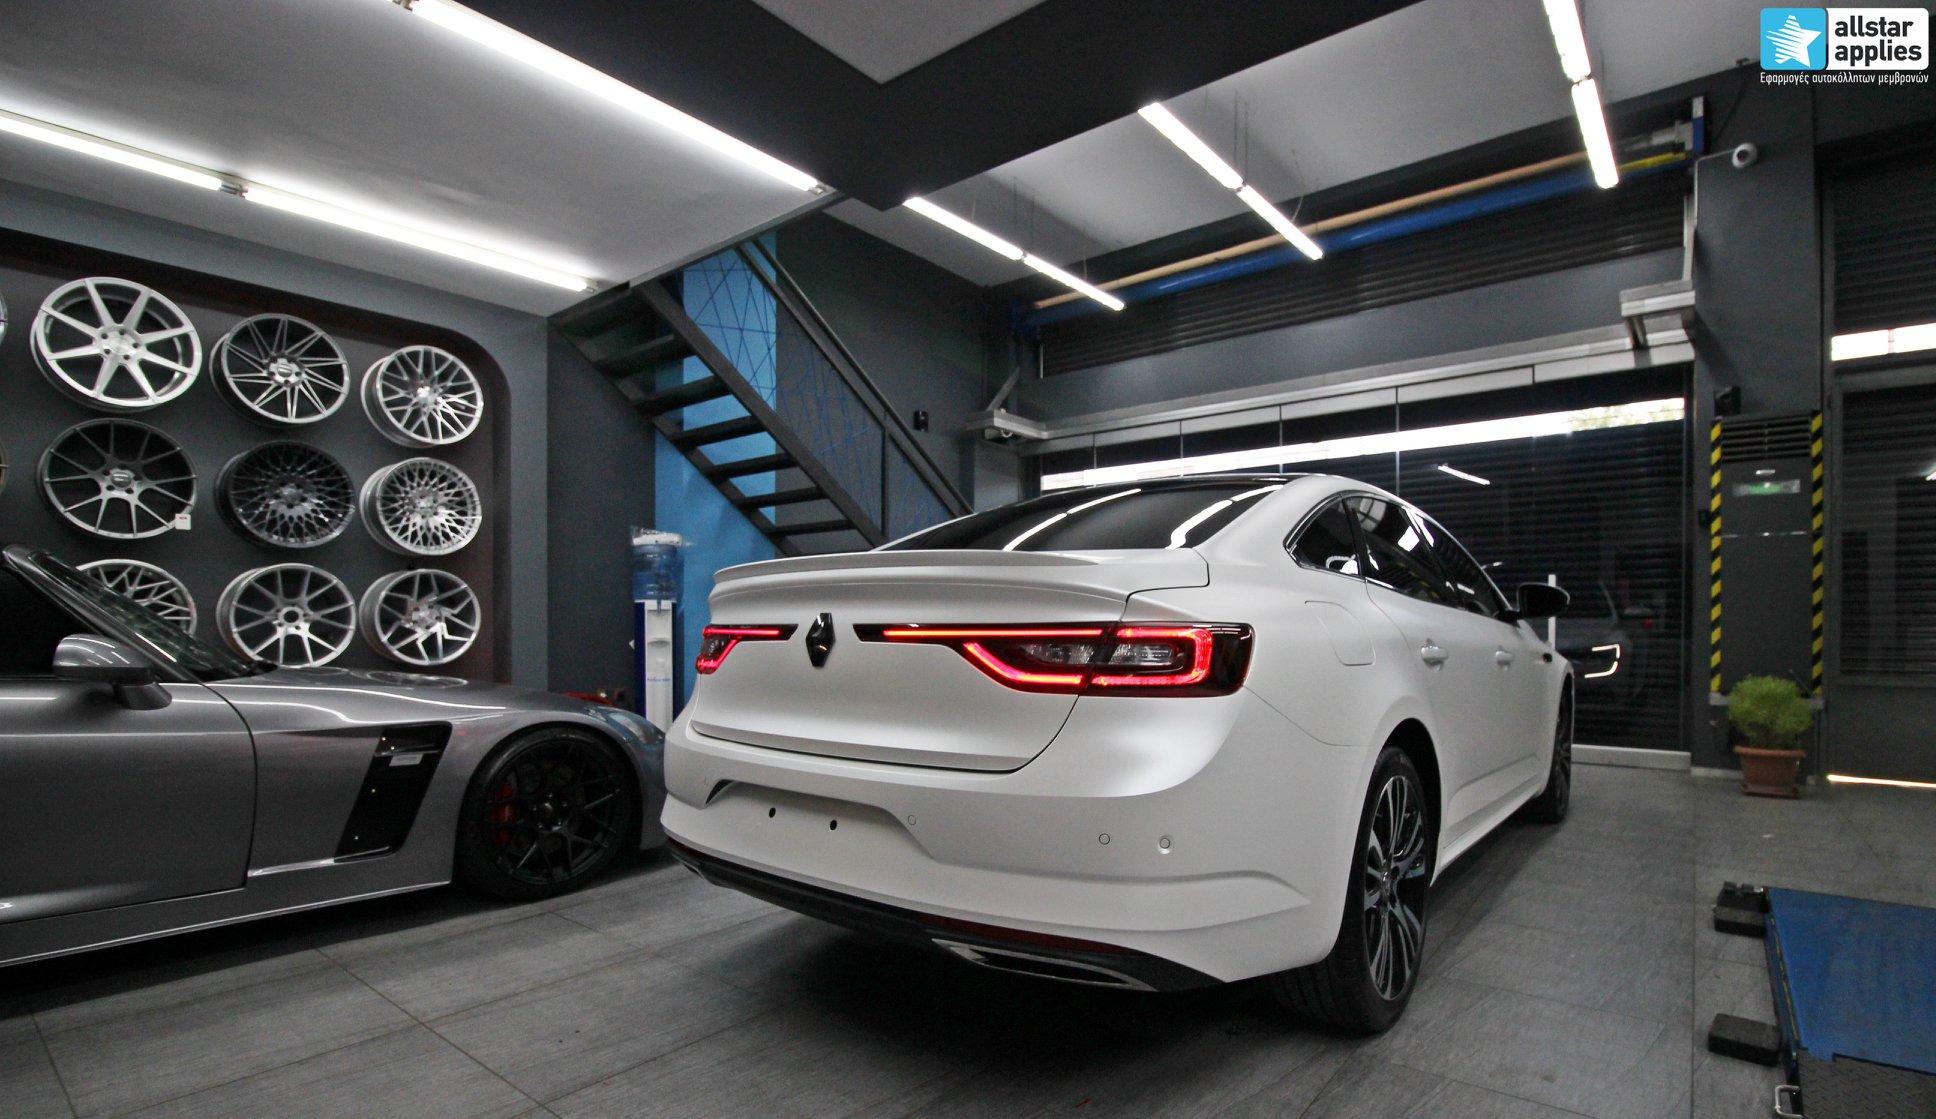 Renault Talisman - Satin Pearl White (5)